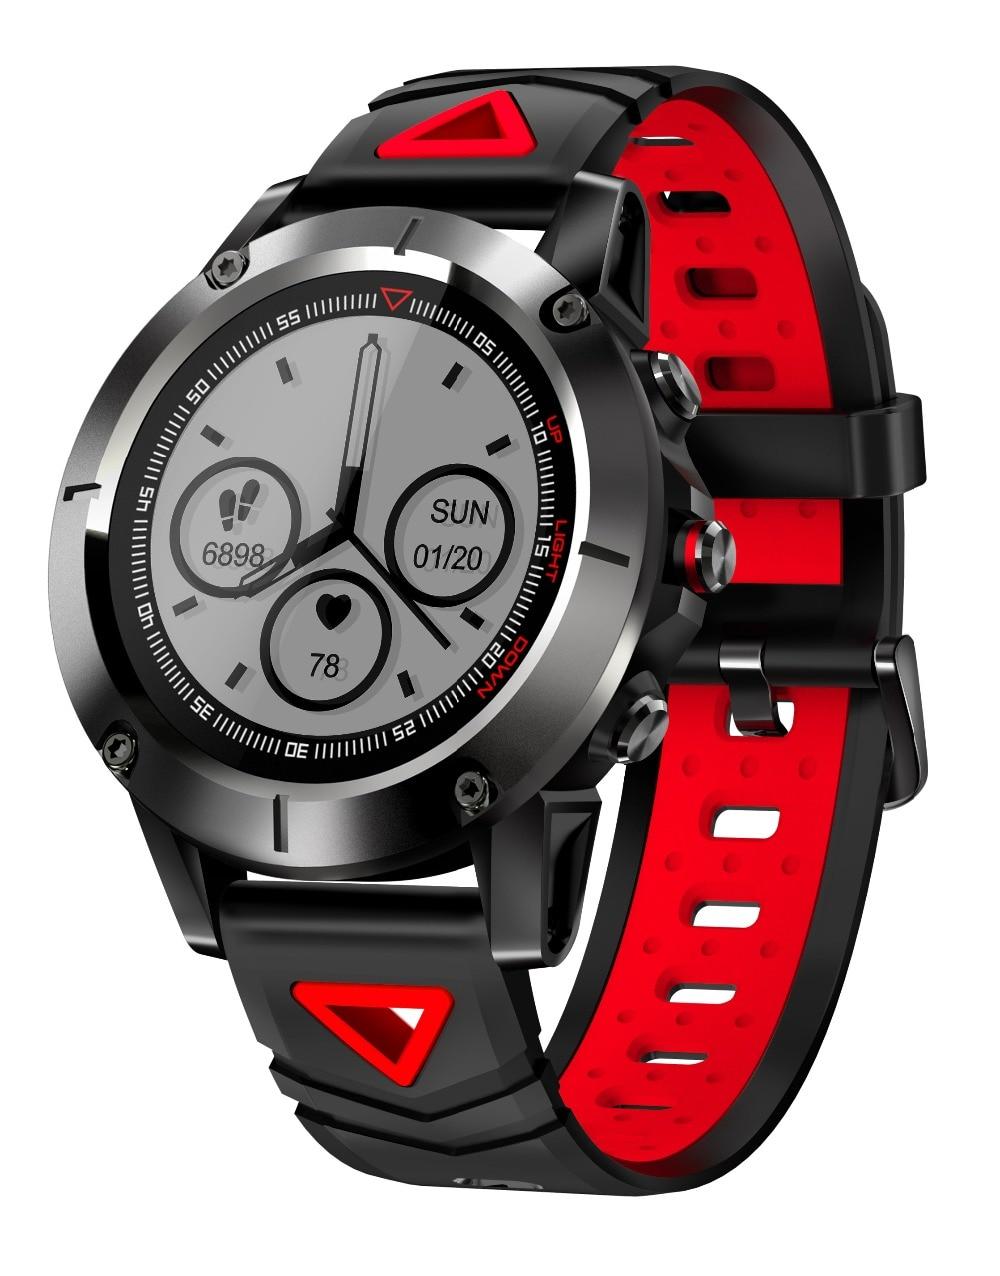 moonlinks G01 GPS Smart Watch Men IP68 Waterproof Blood Pressure wireless Wristwatch Sports Compass Smartwatch for Android IOS